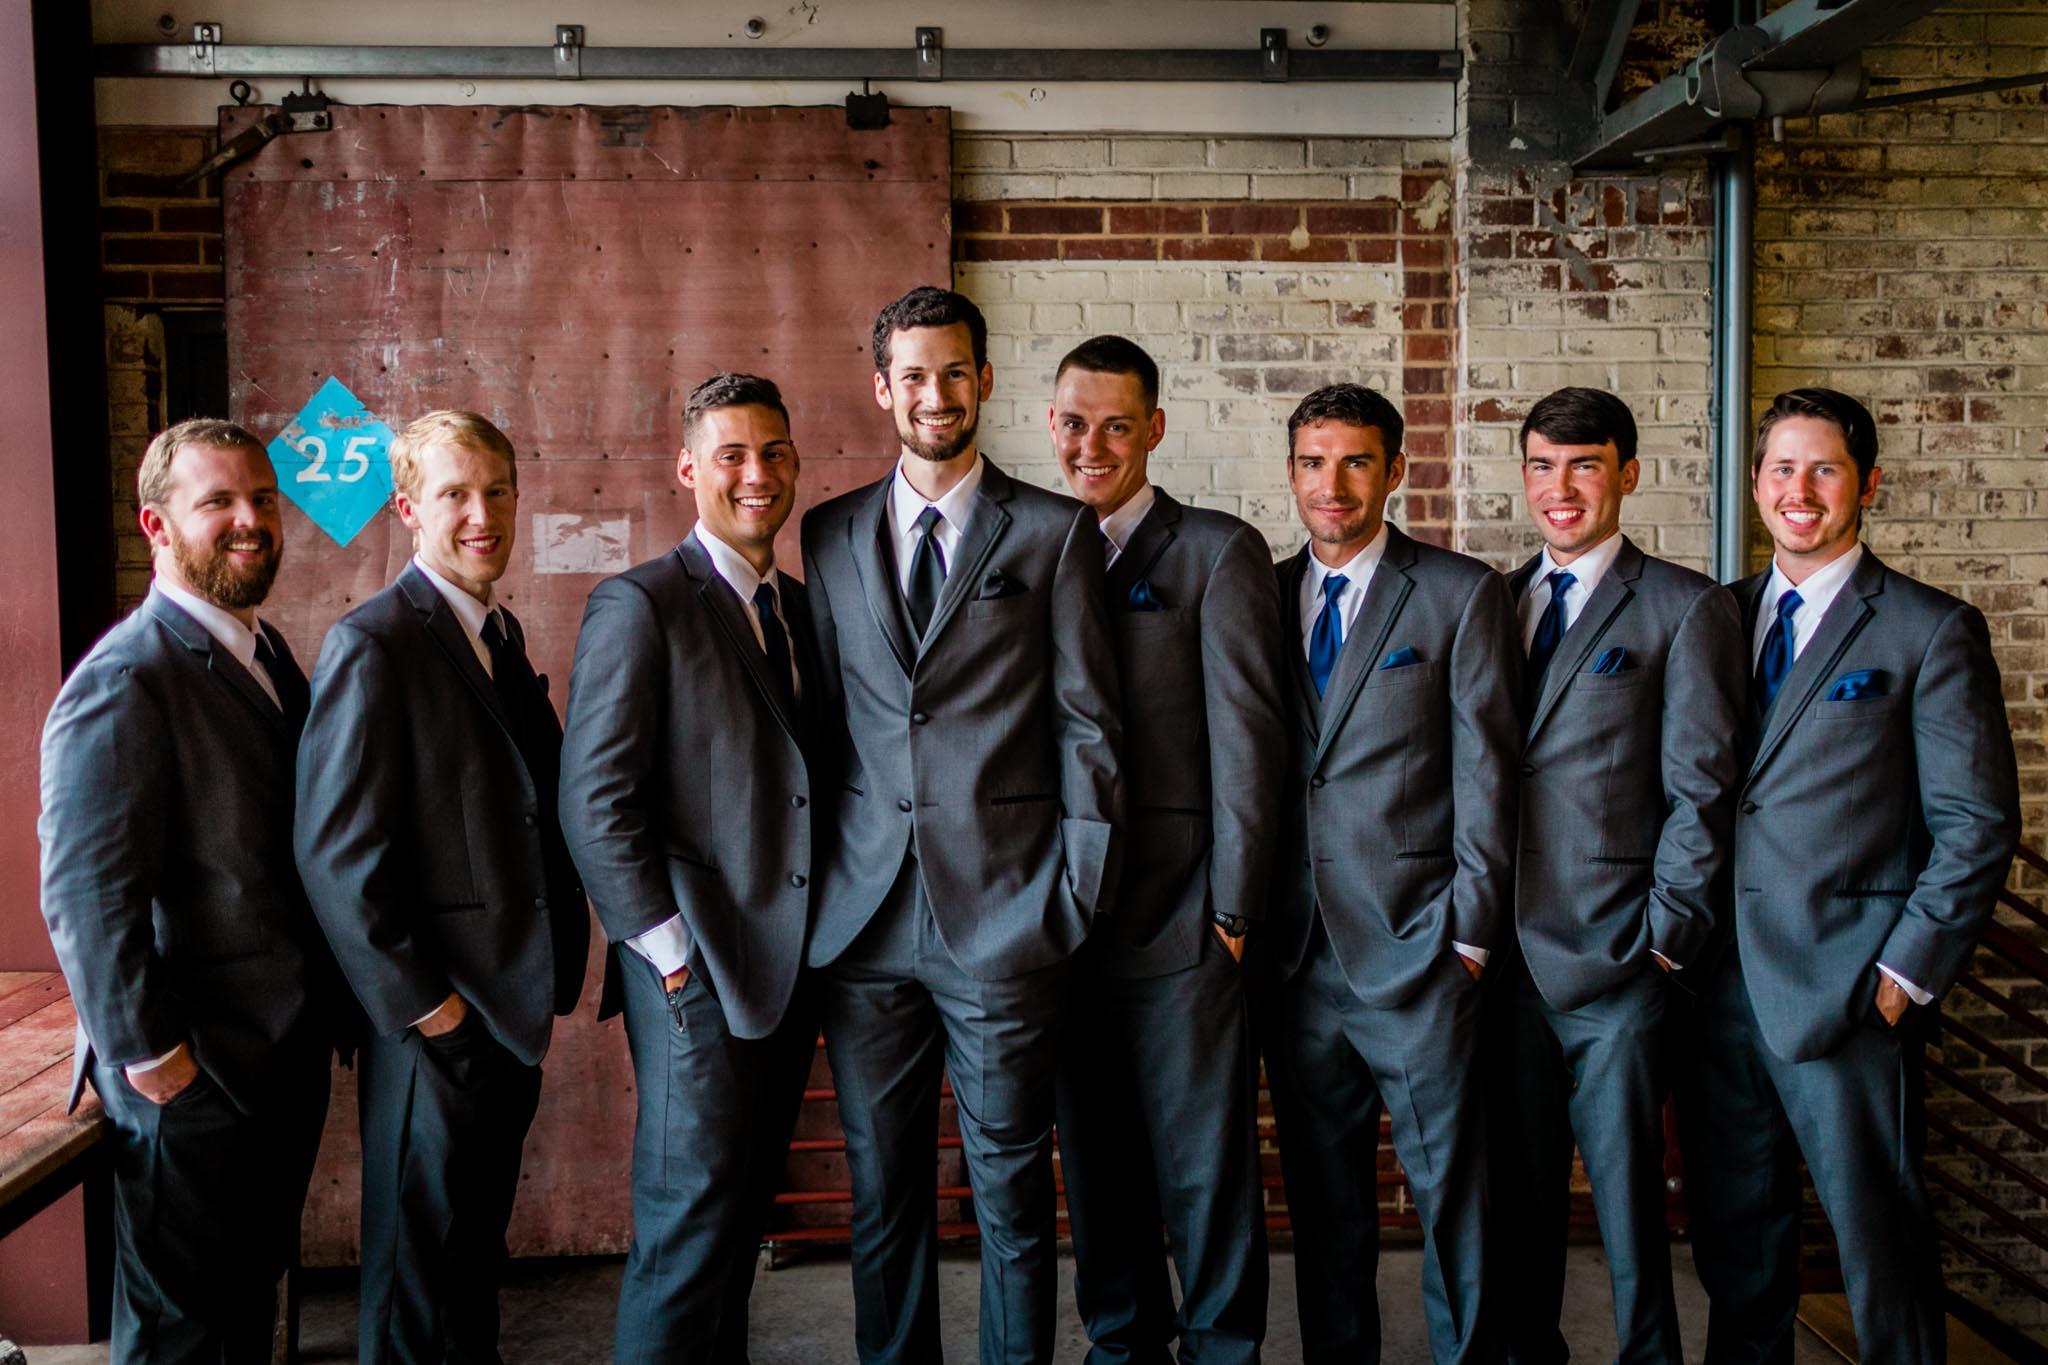 Groomsmen at Haw River Ballroom in Saxapahaw   Durham Wedding Photographer   By G. Lin Photography